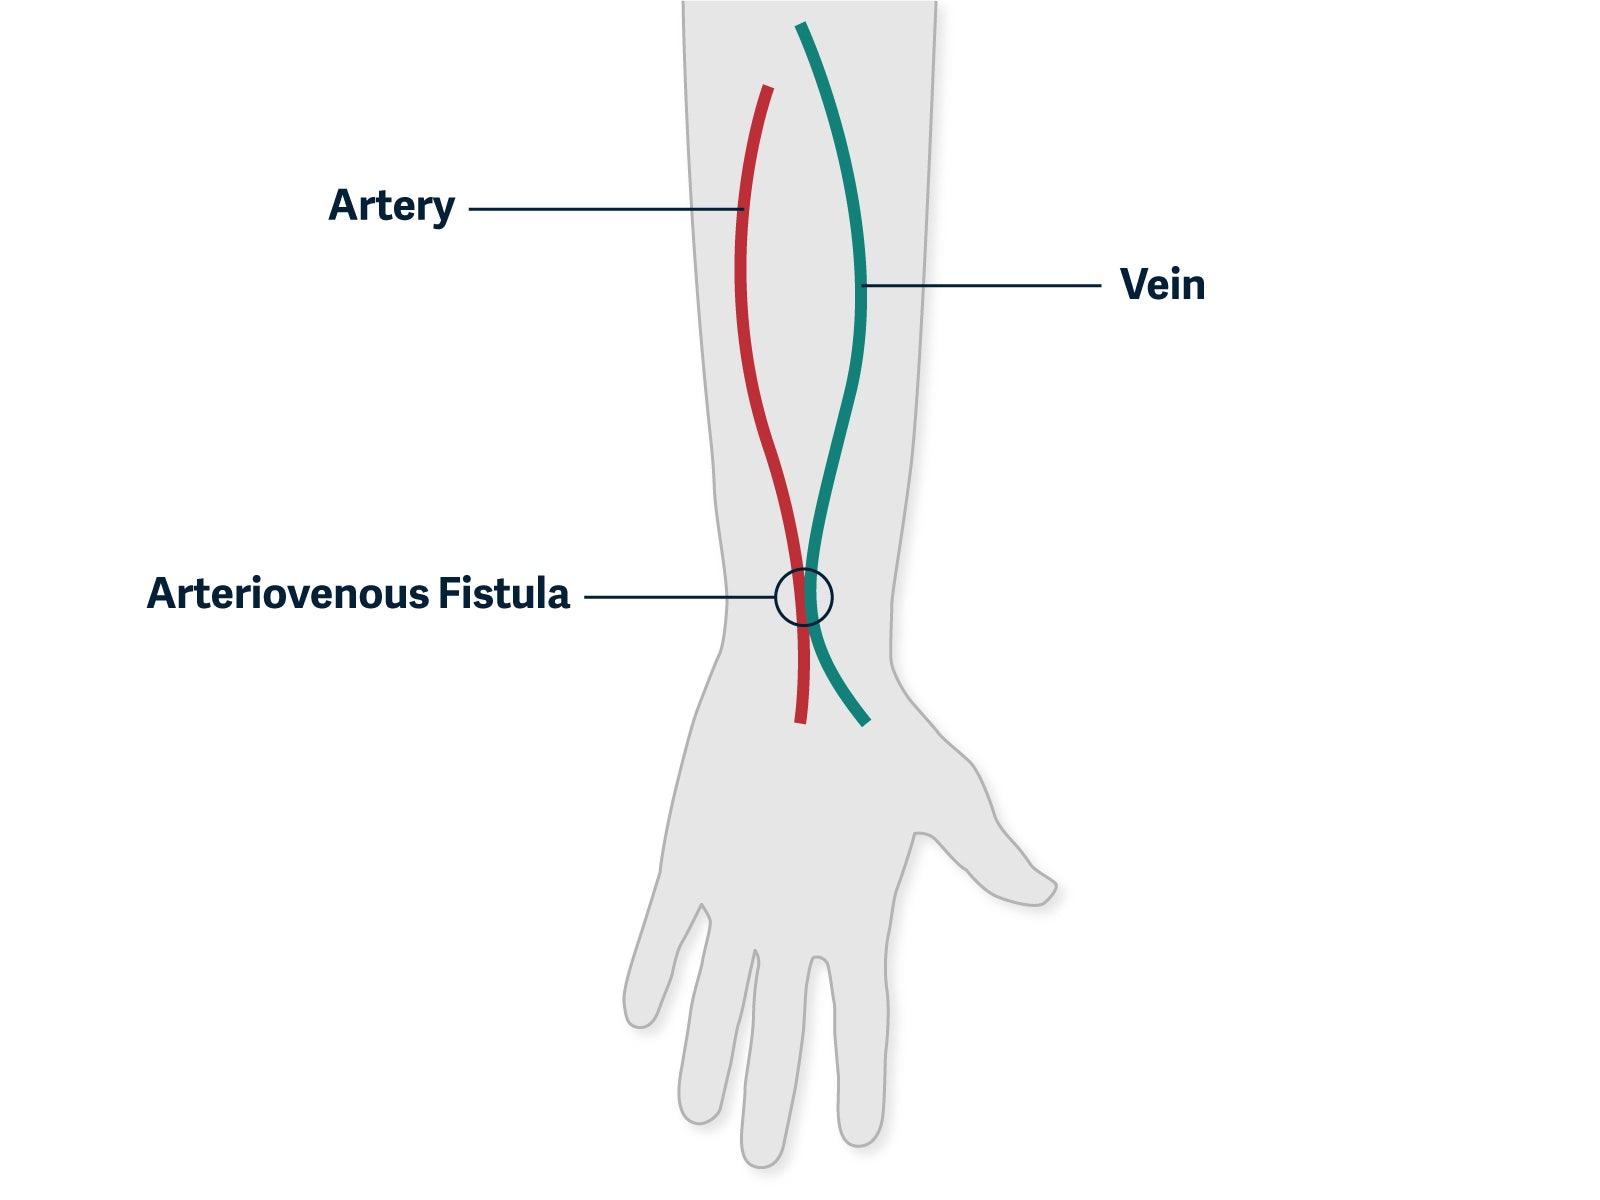 graphic showing a fistula